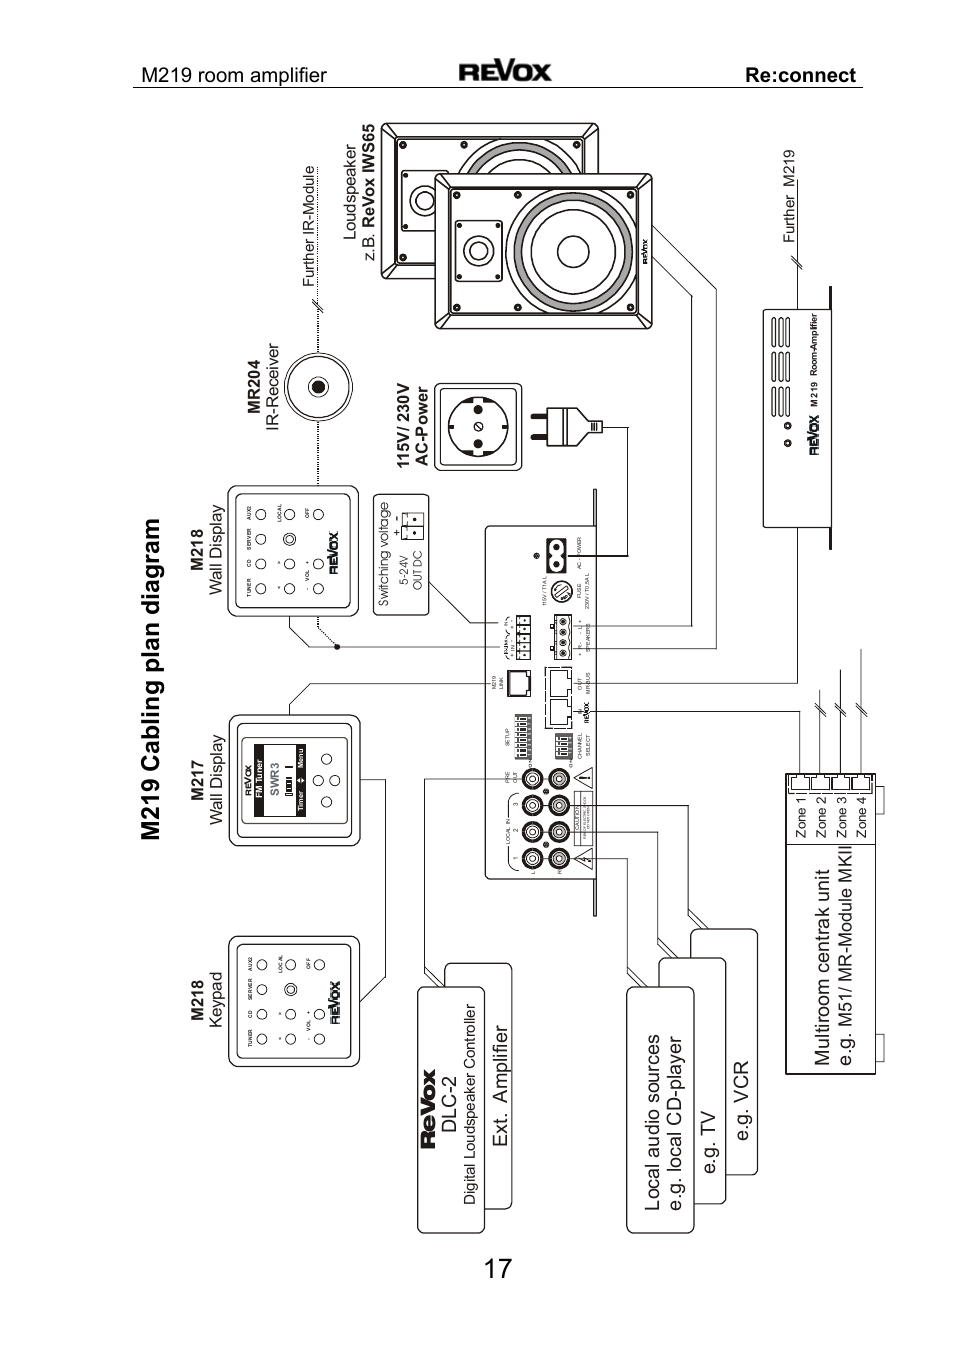 M219 cabli ng plan diagram, M219 room amplifier, Re